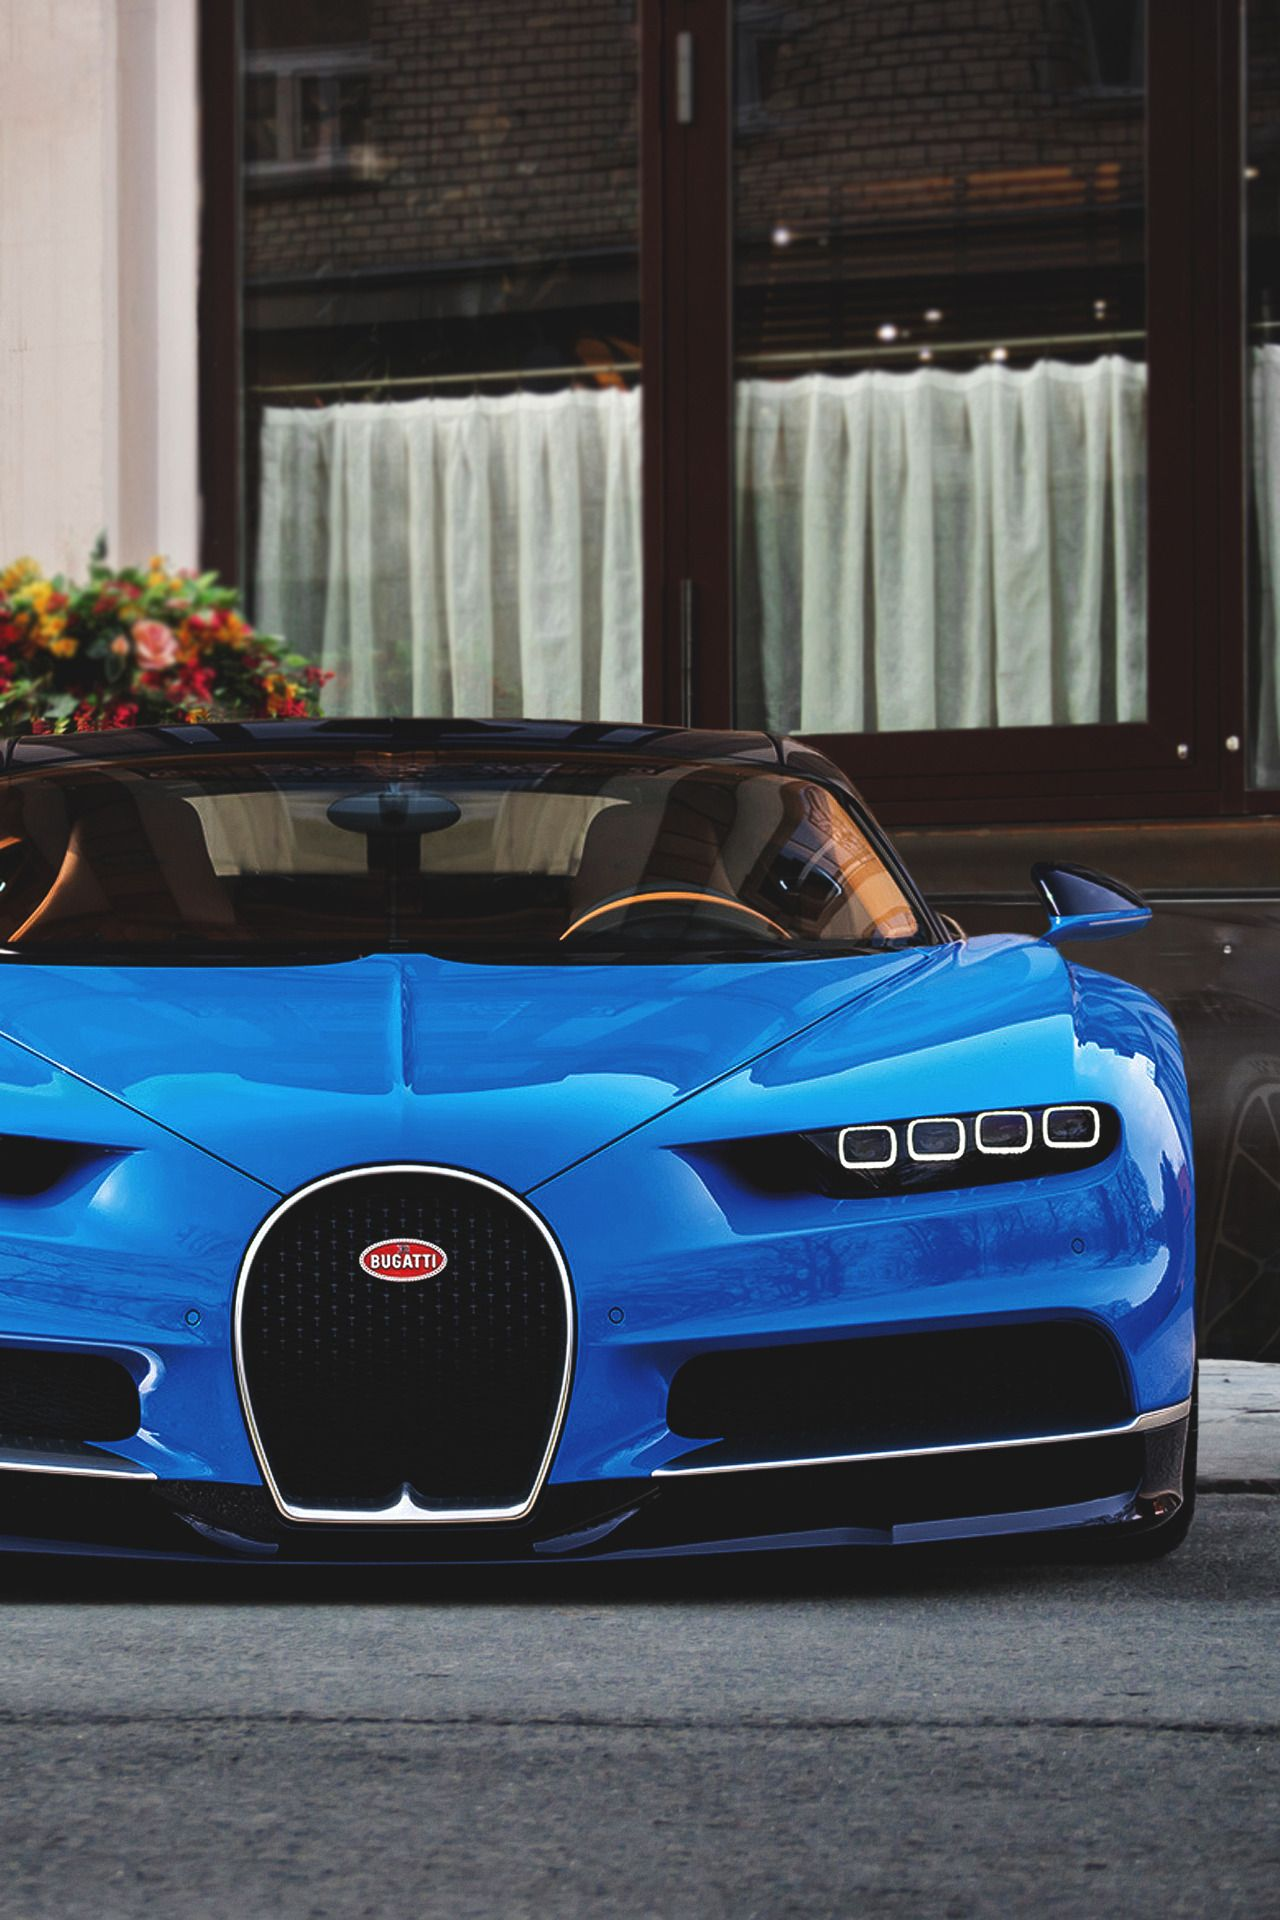 The Outrageous Bugatti Veyron Bugatti Chiron Bugatti Bugatti Cars